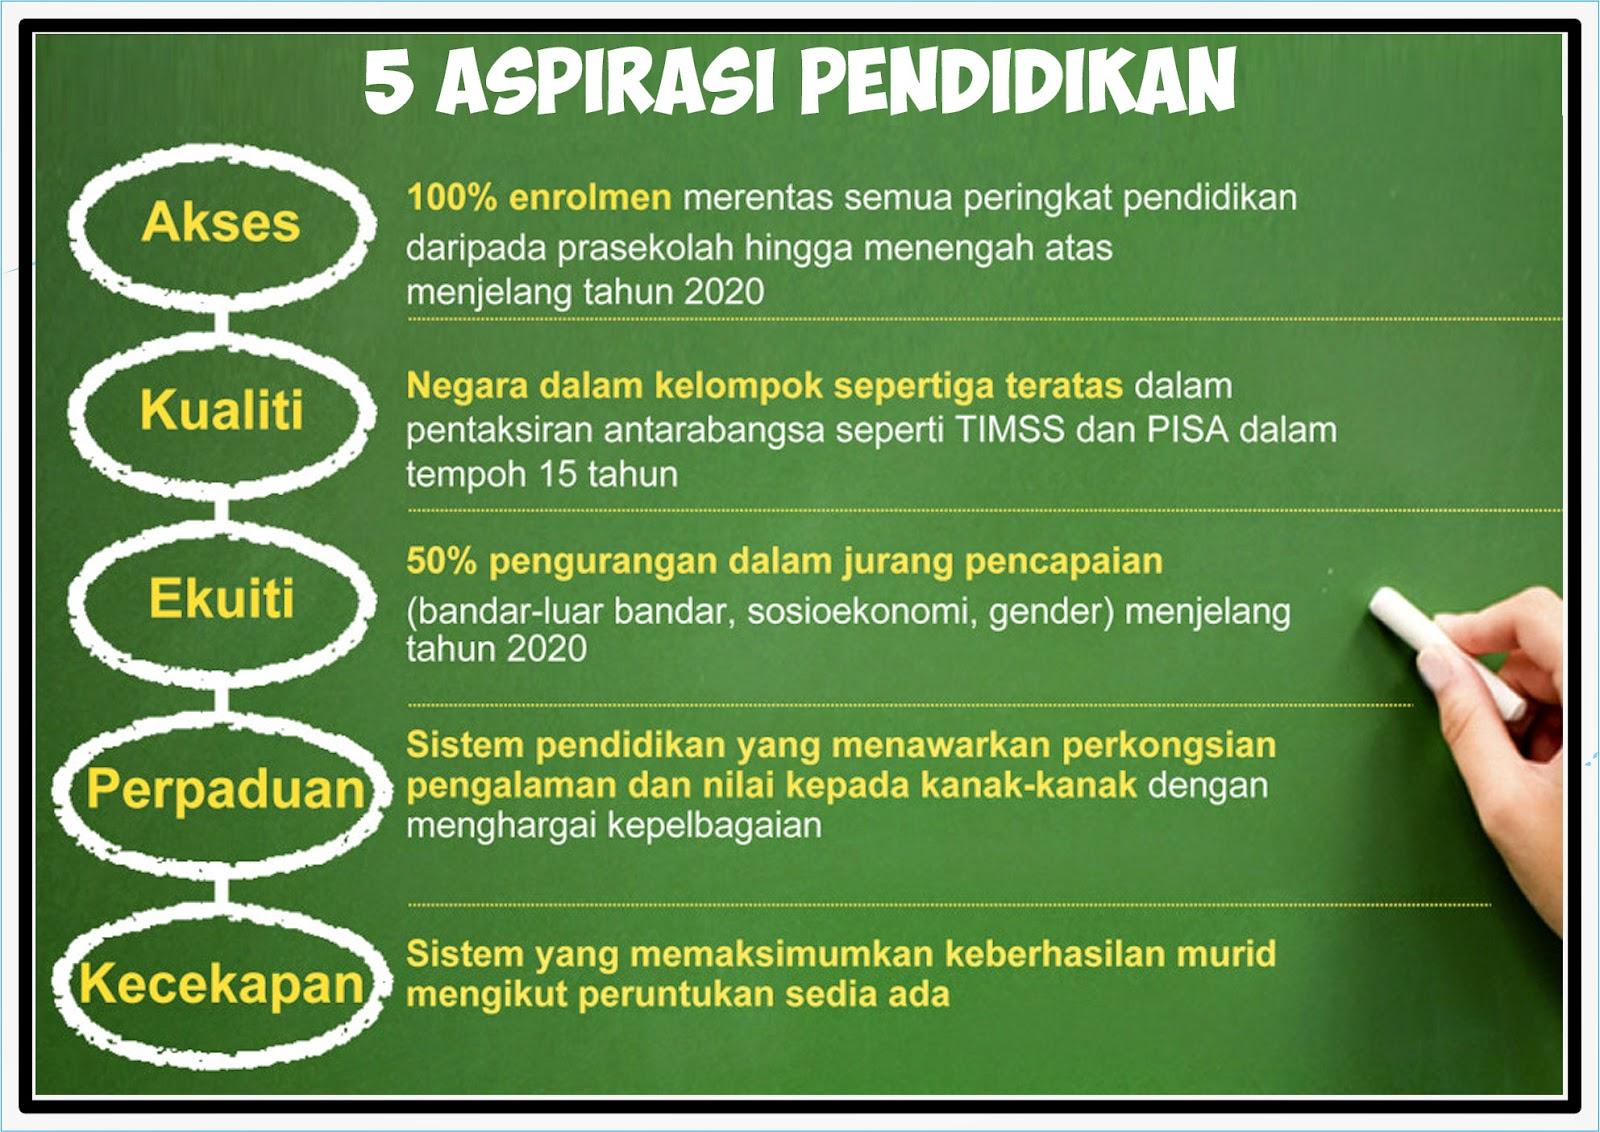 Coet Kms Ringkasan Pelan Pembangunan Pendidikan Malaysia Pppm